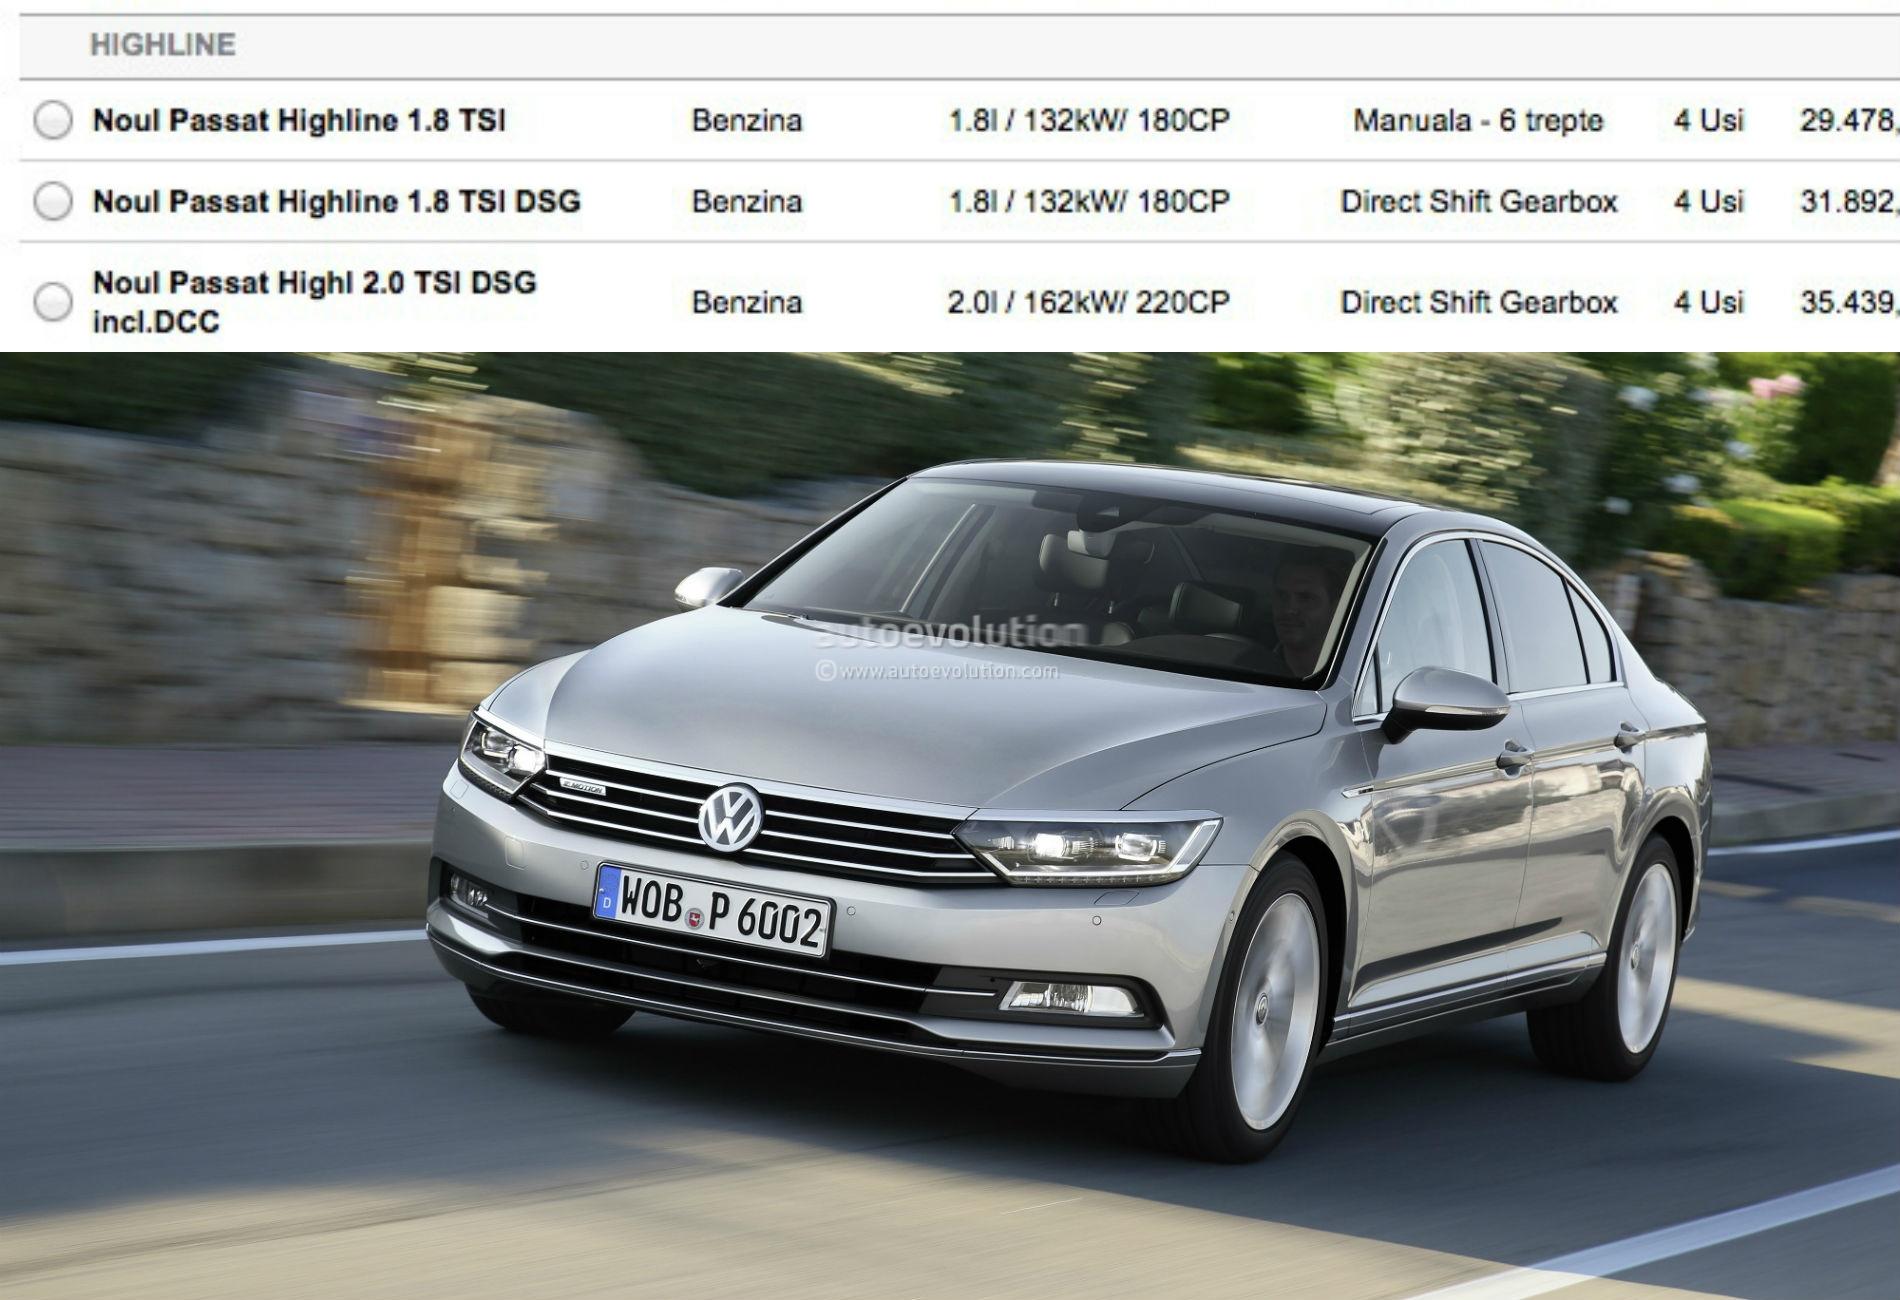 2015 Volkswagen Passat B8: 1.8 TSI and 2.0 TSI Engines Launched - autoevolution